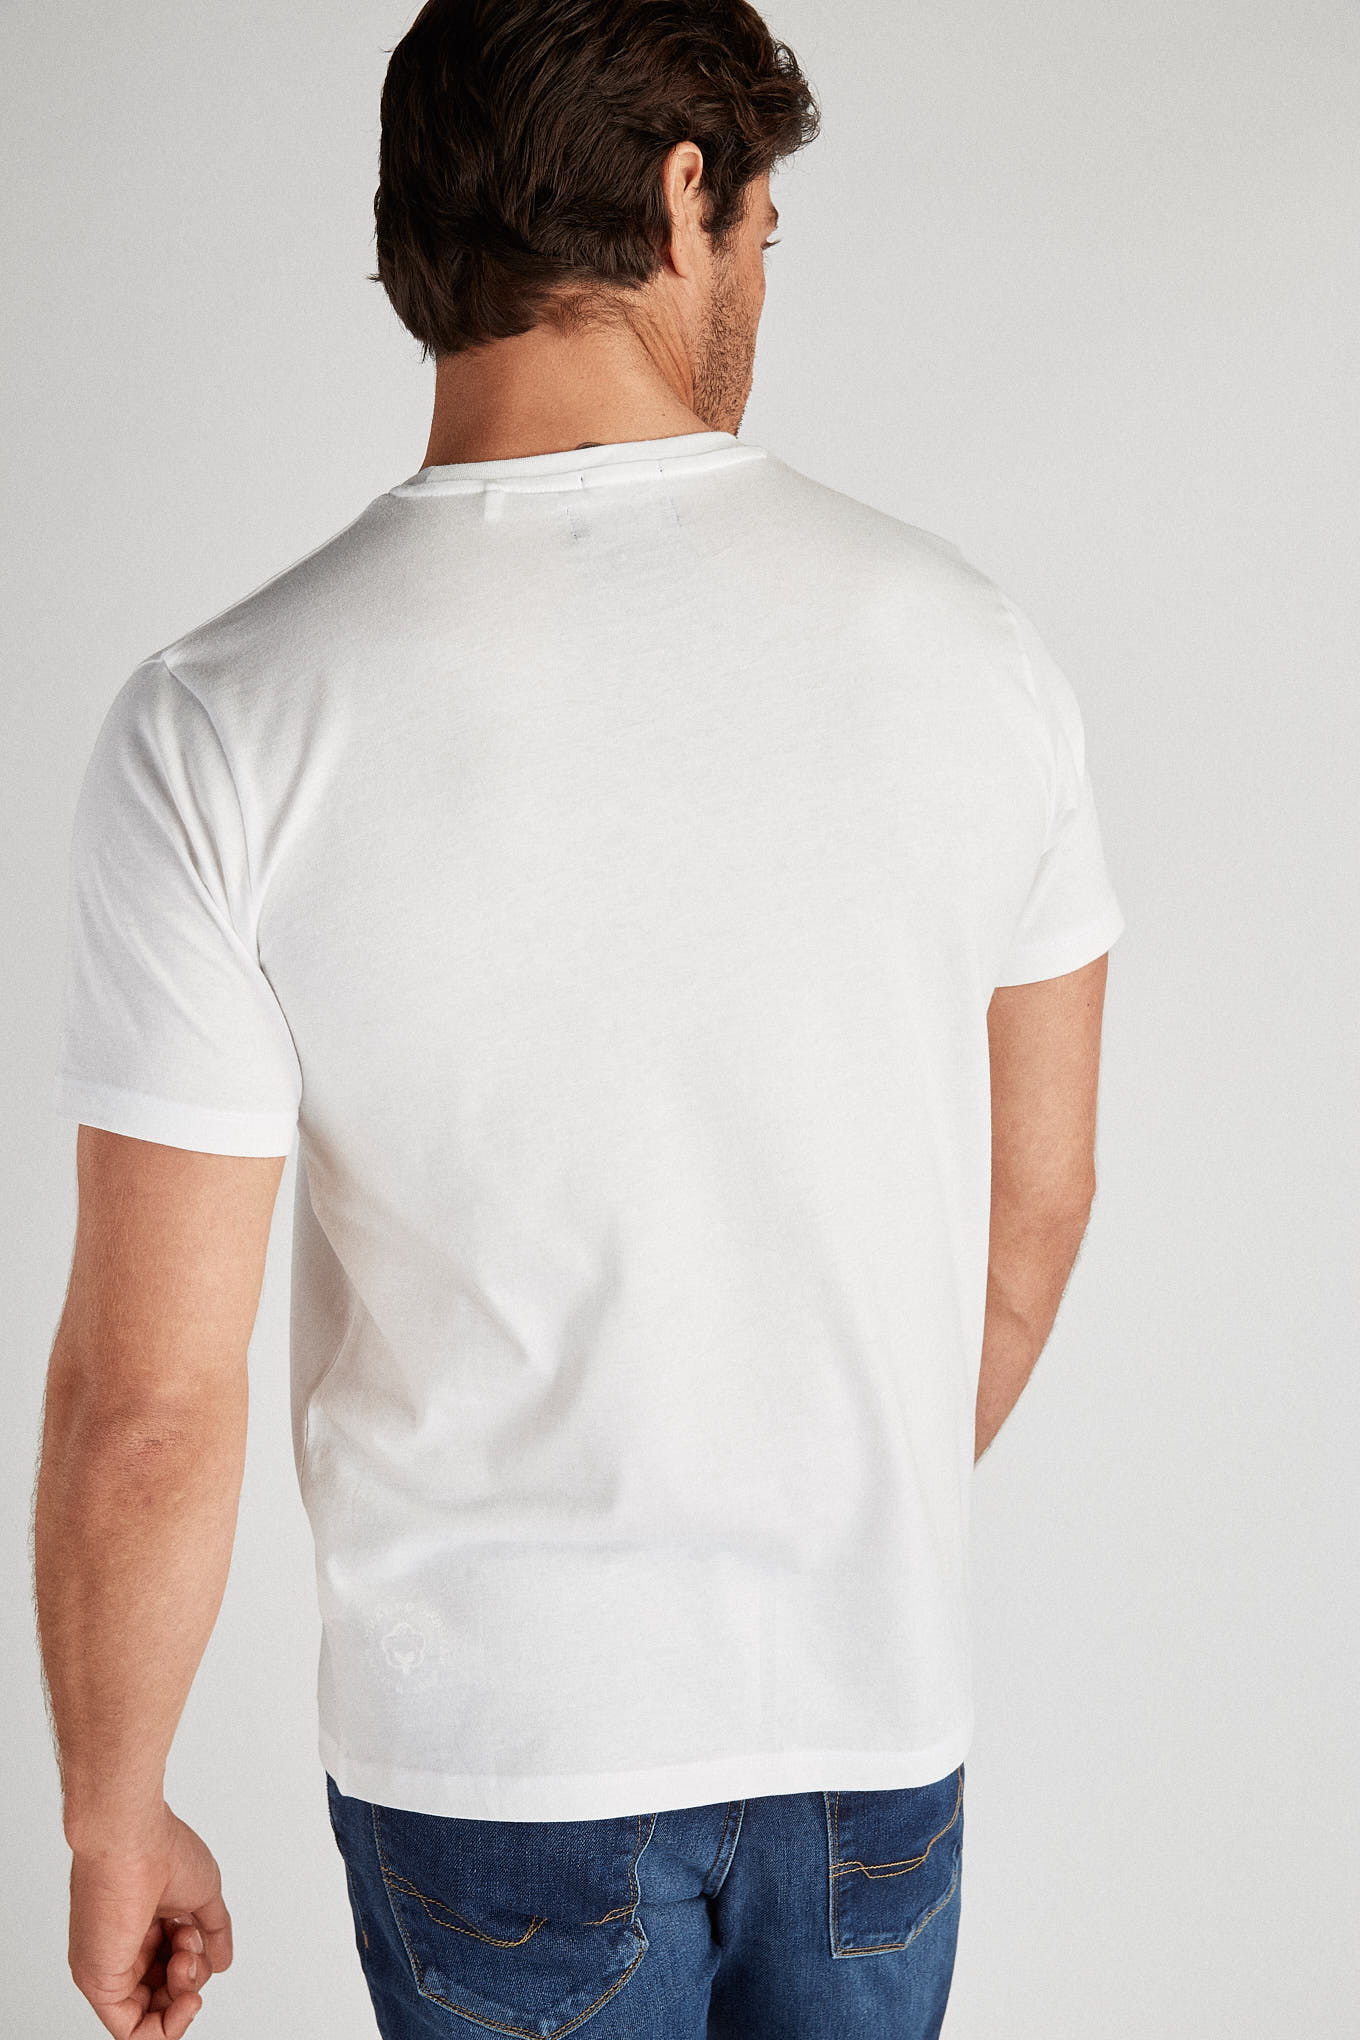 T-Shirt Cru Sport Homem